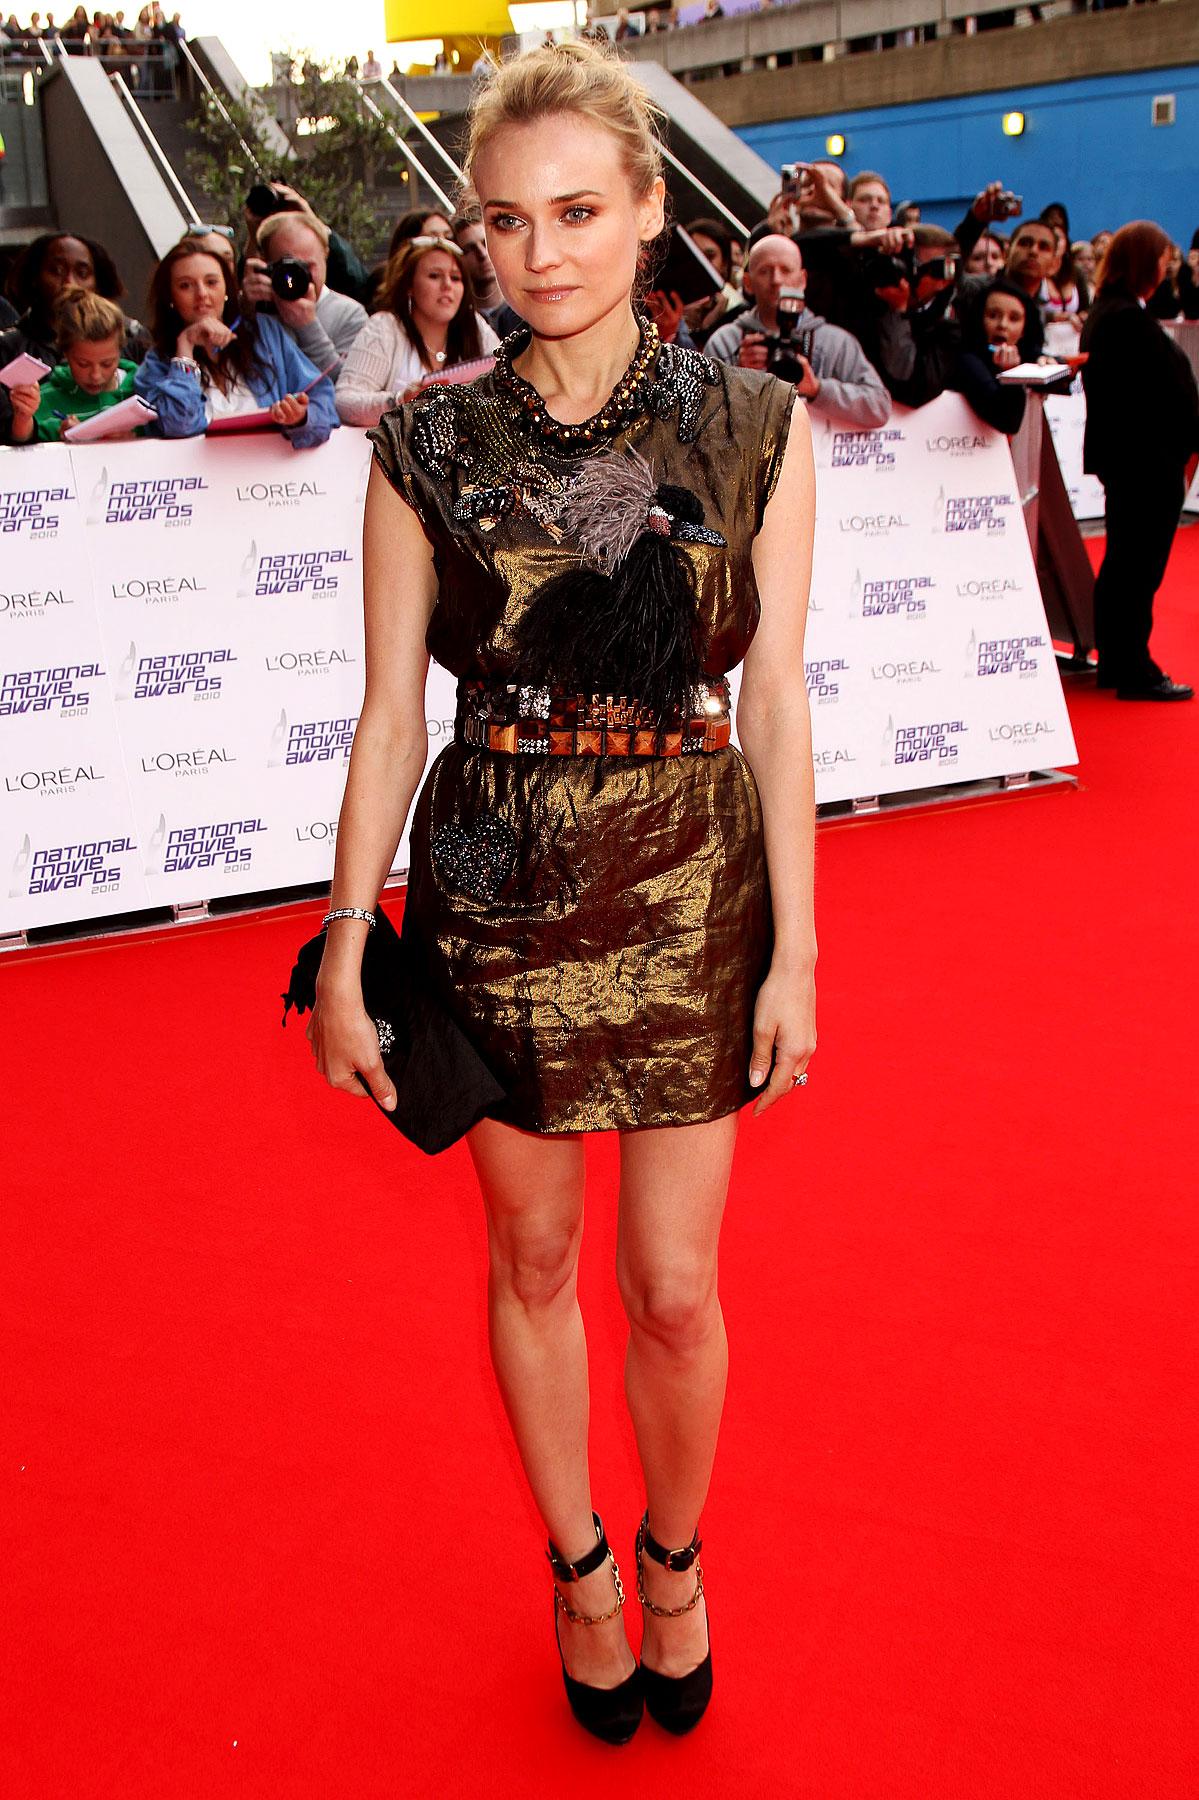 Fashion FTW: Diane Kruger's Dress Flips The Bird (PHOTOS)